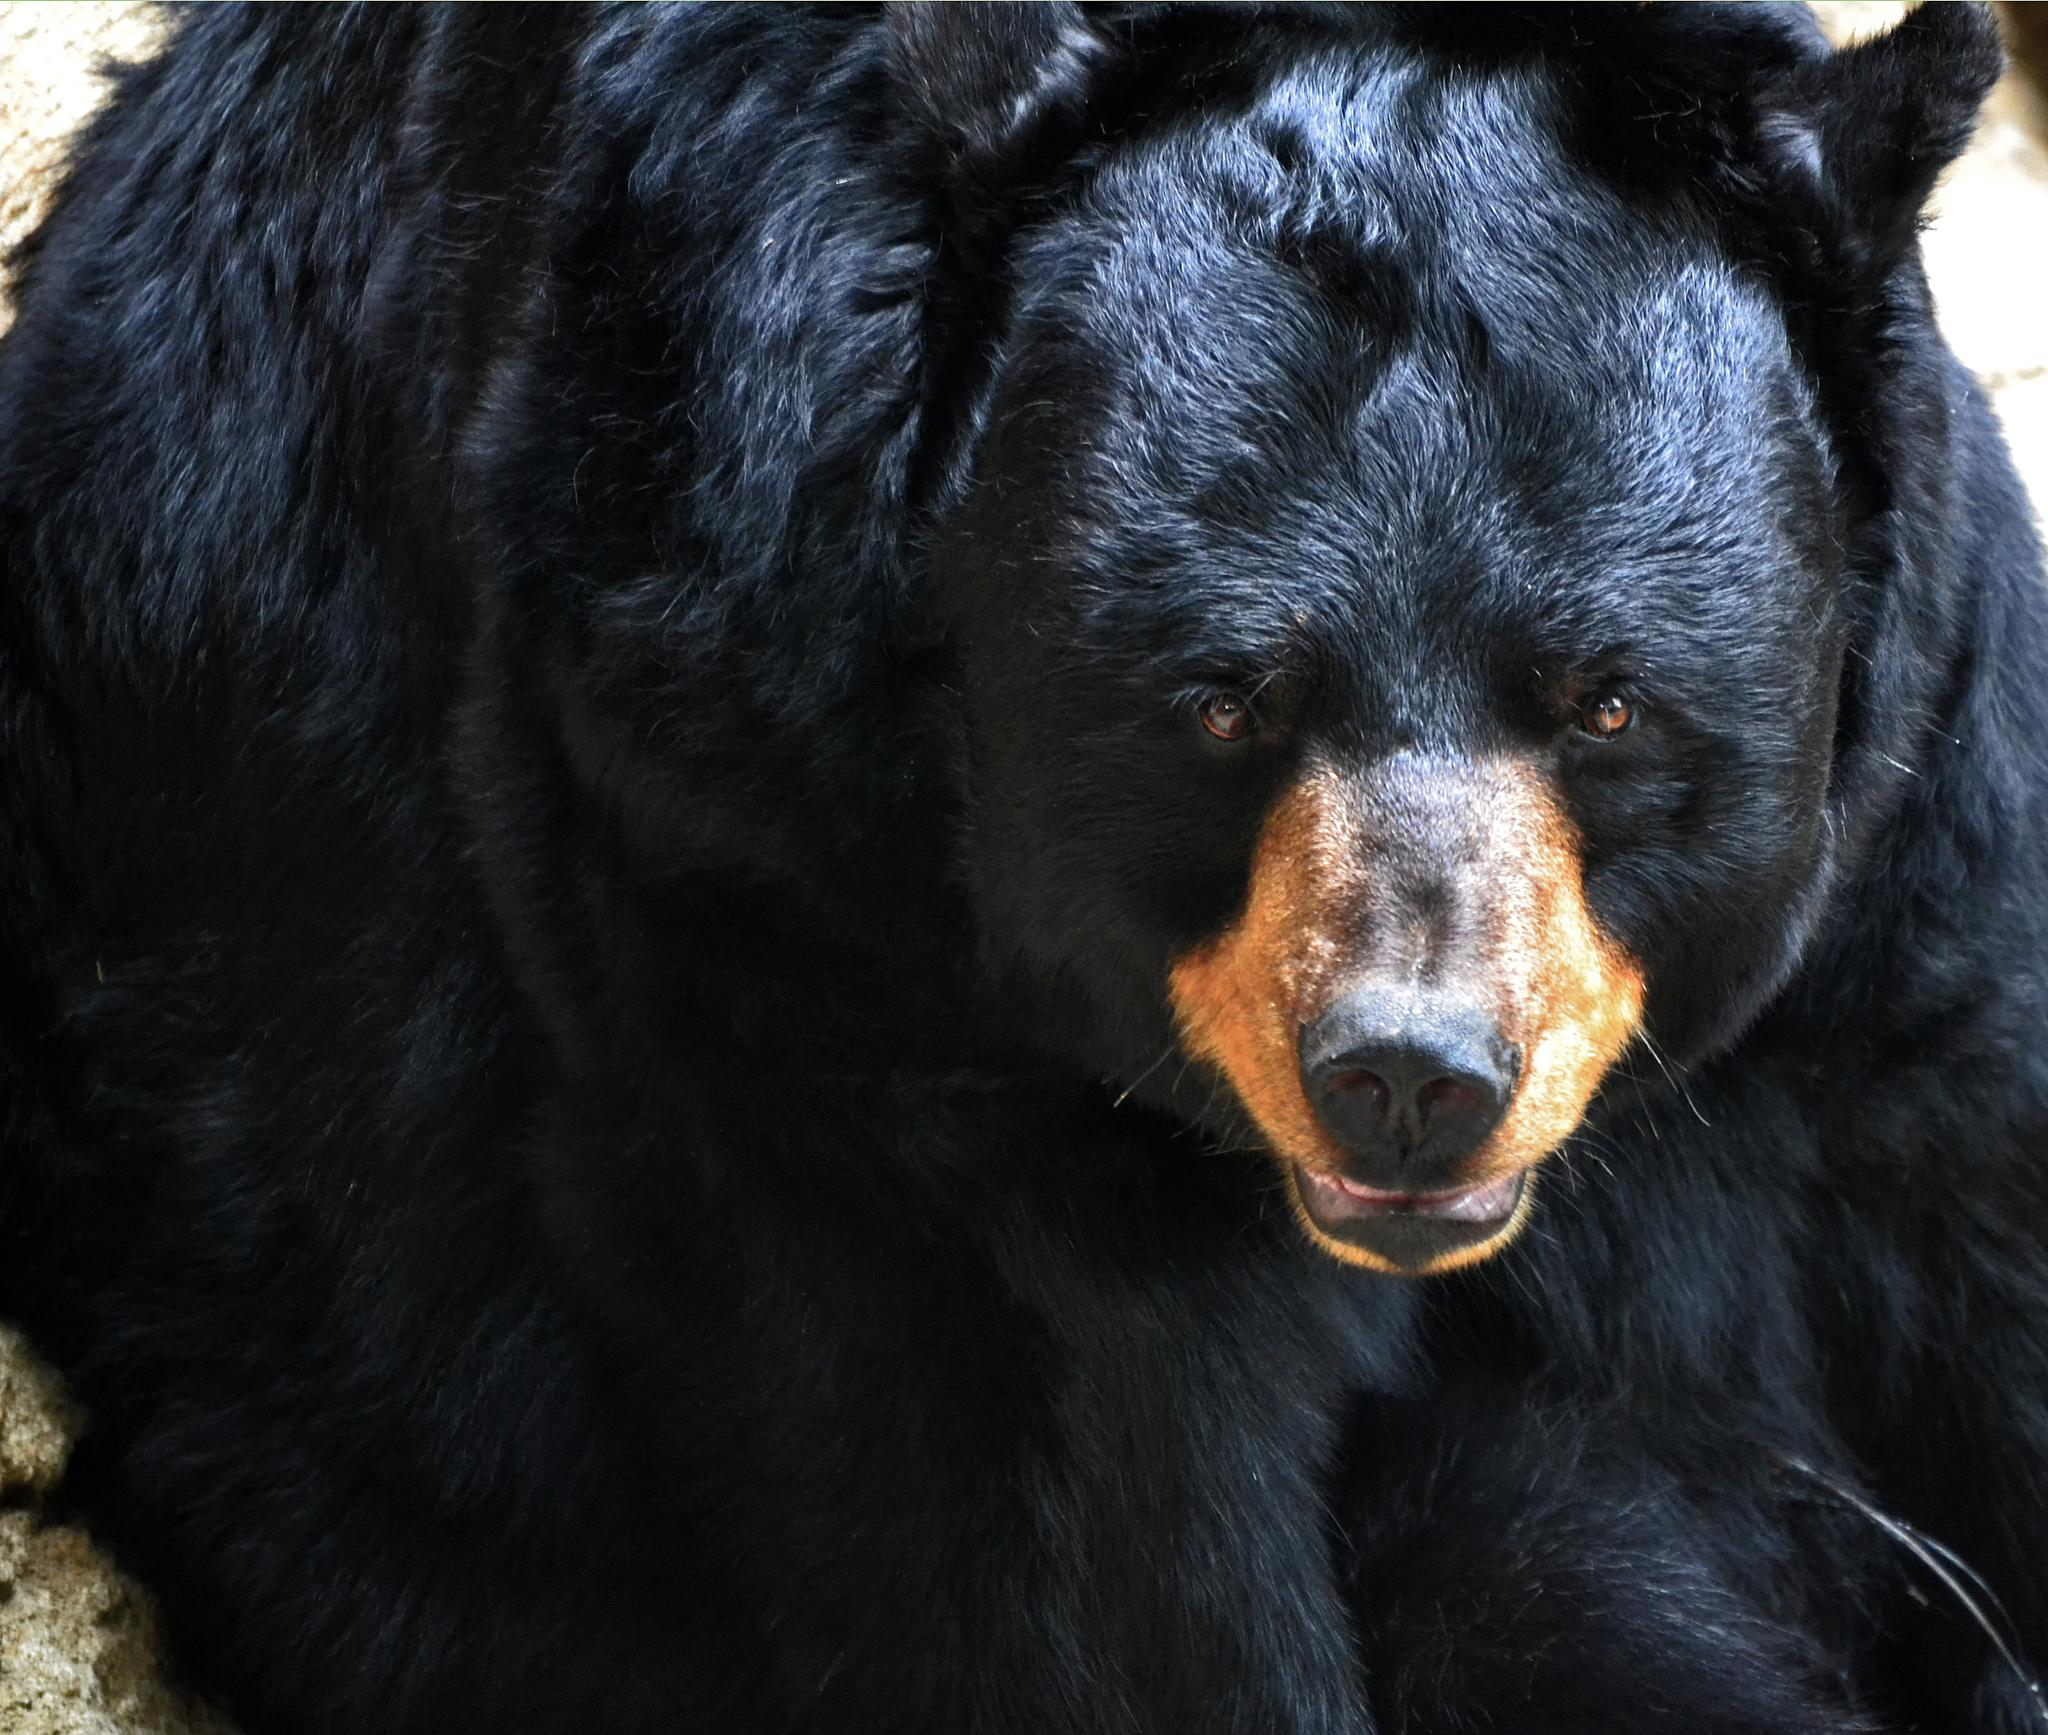 Black Bear by Annie Huber